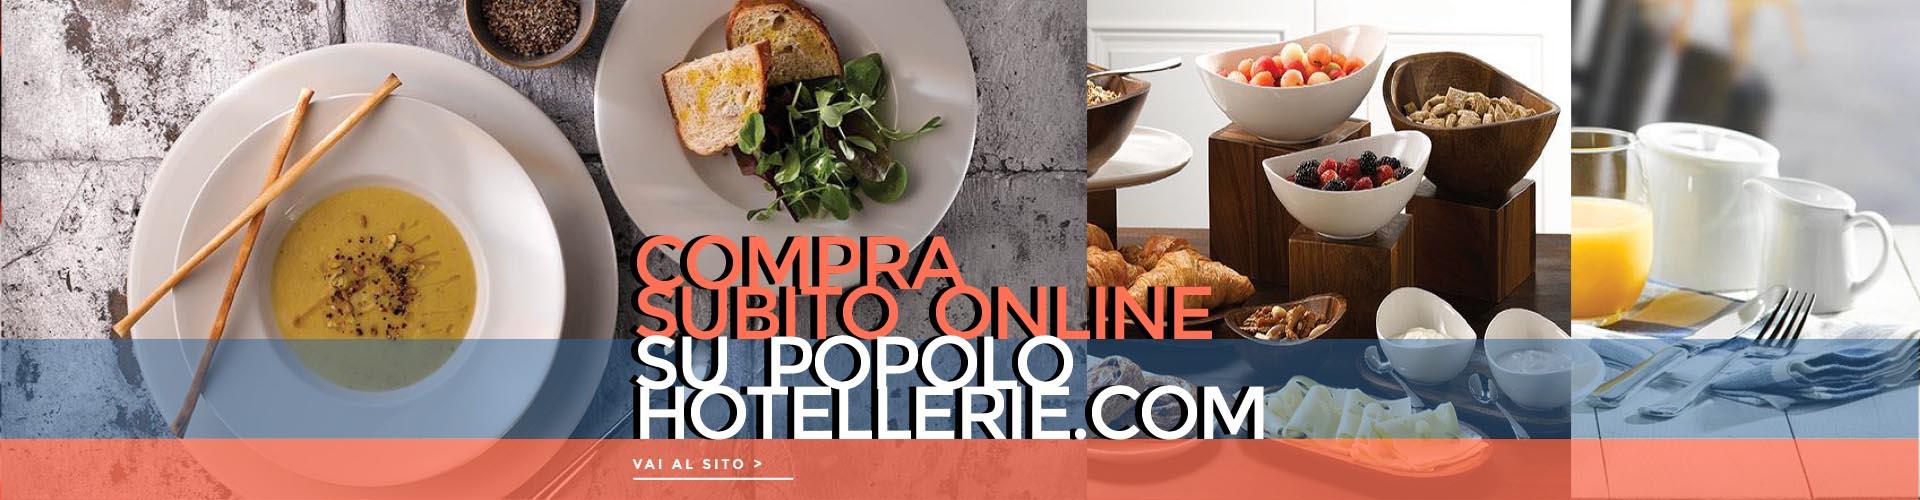 banner-04-compra-online